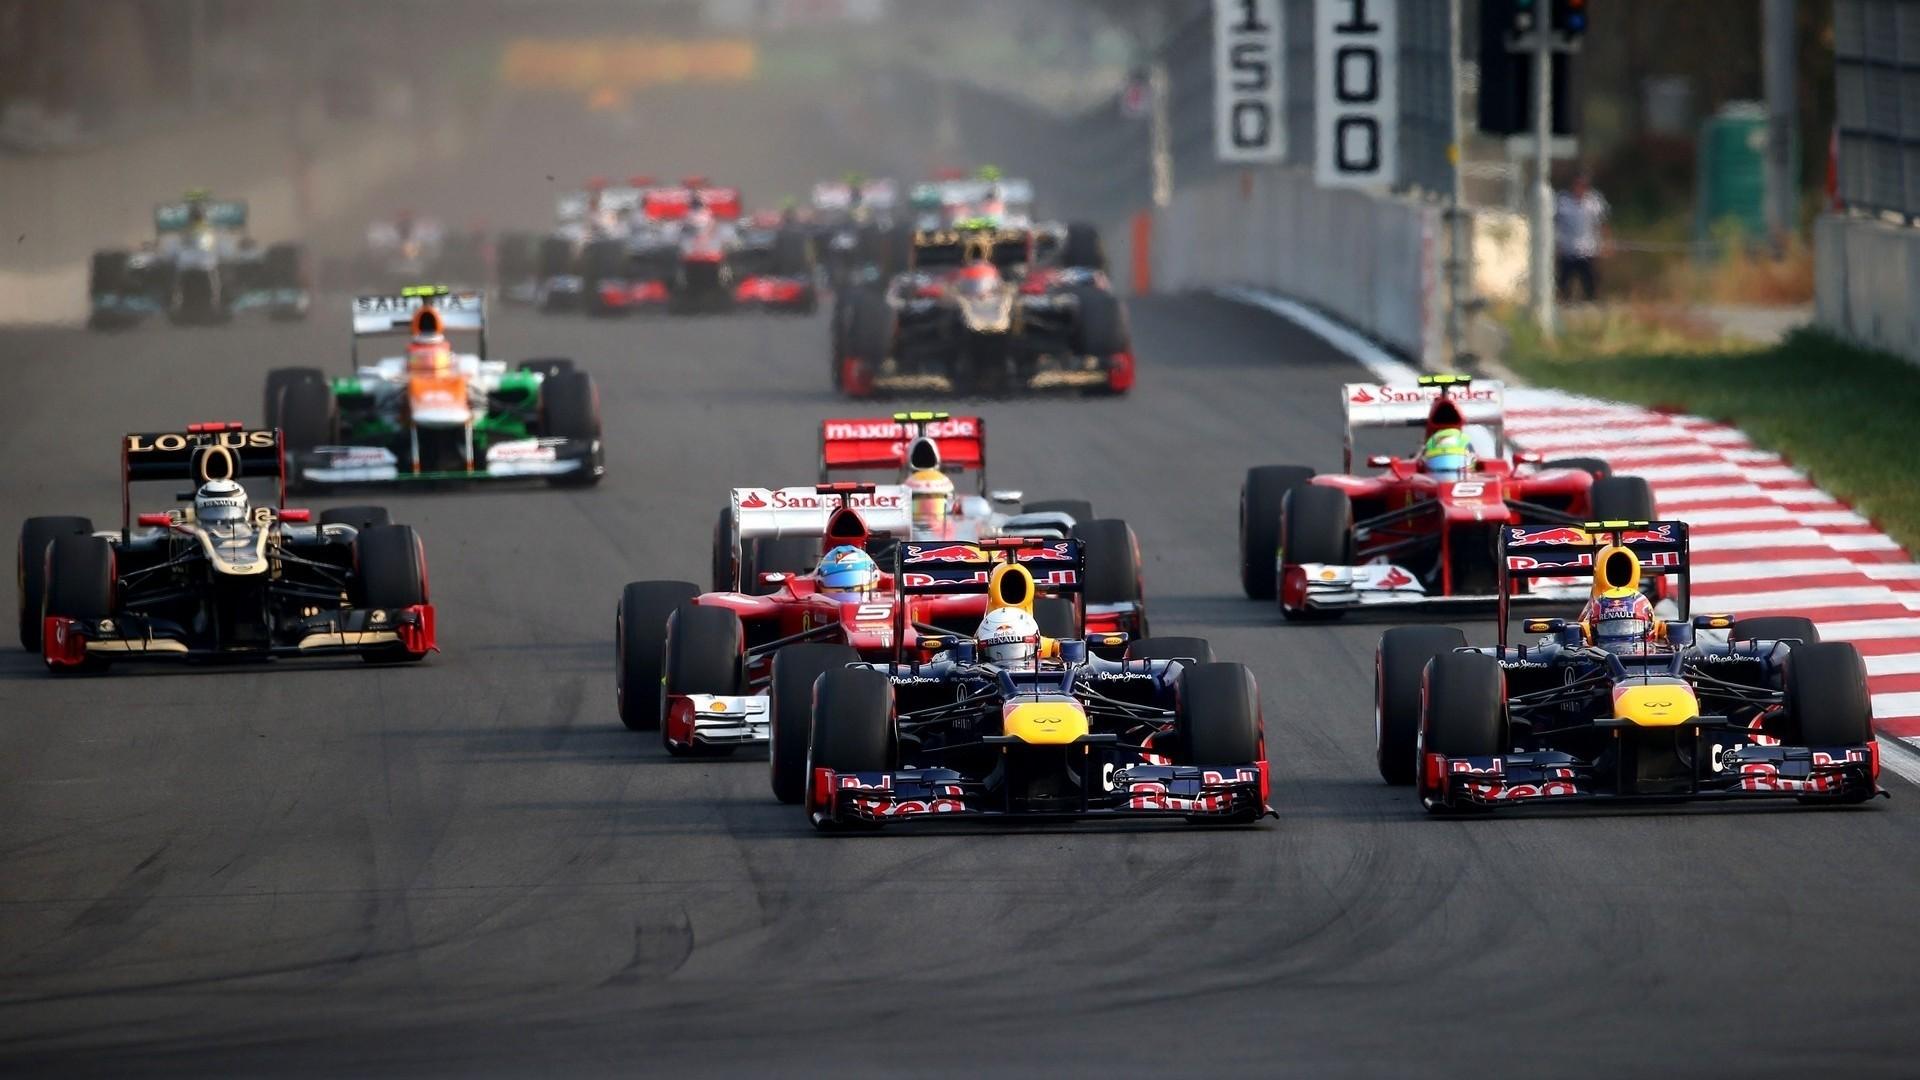 Formula 1 Wallpaper Picture hd